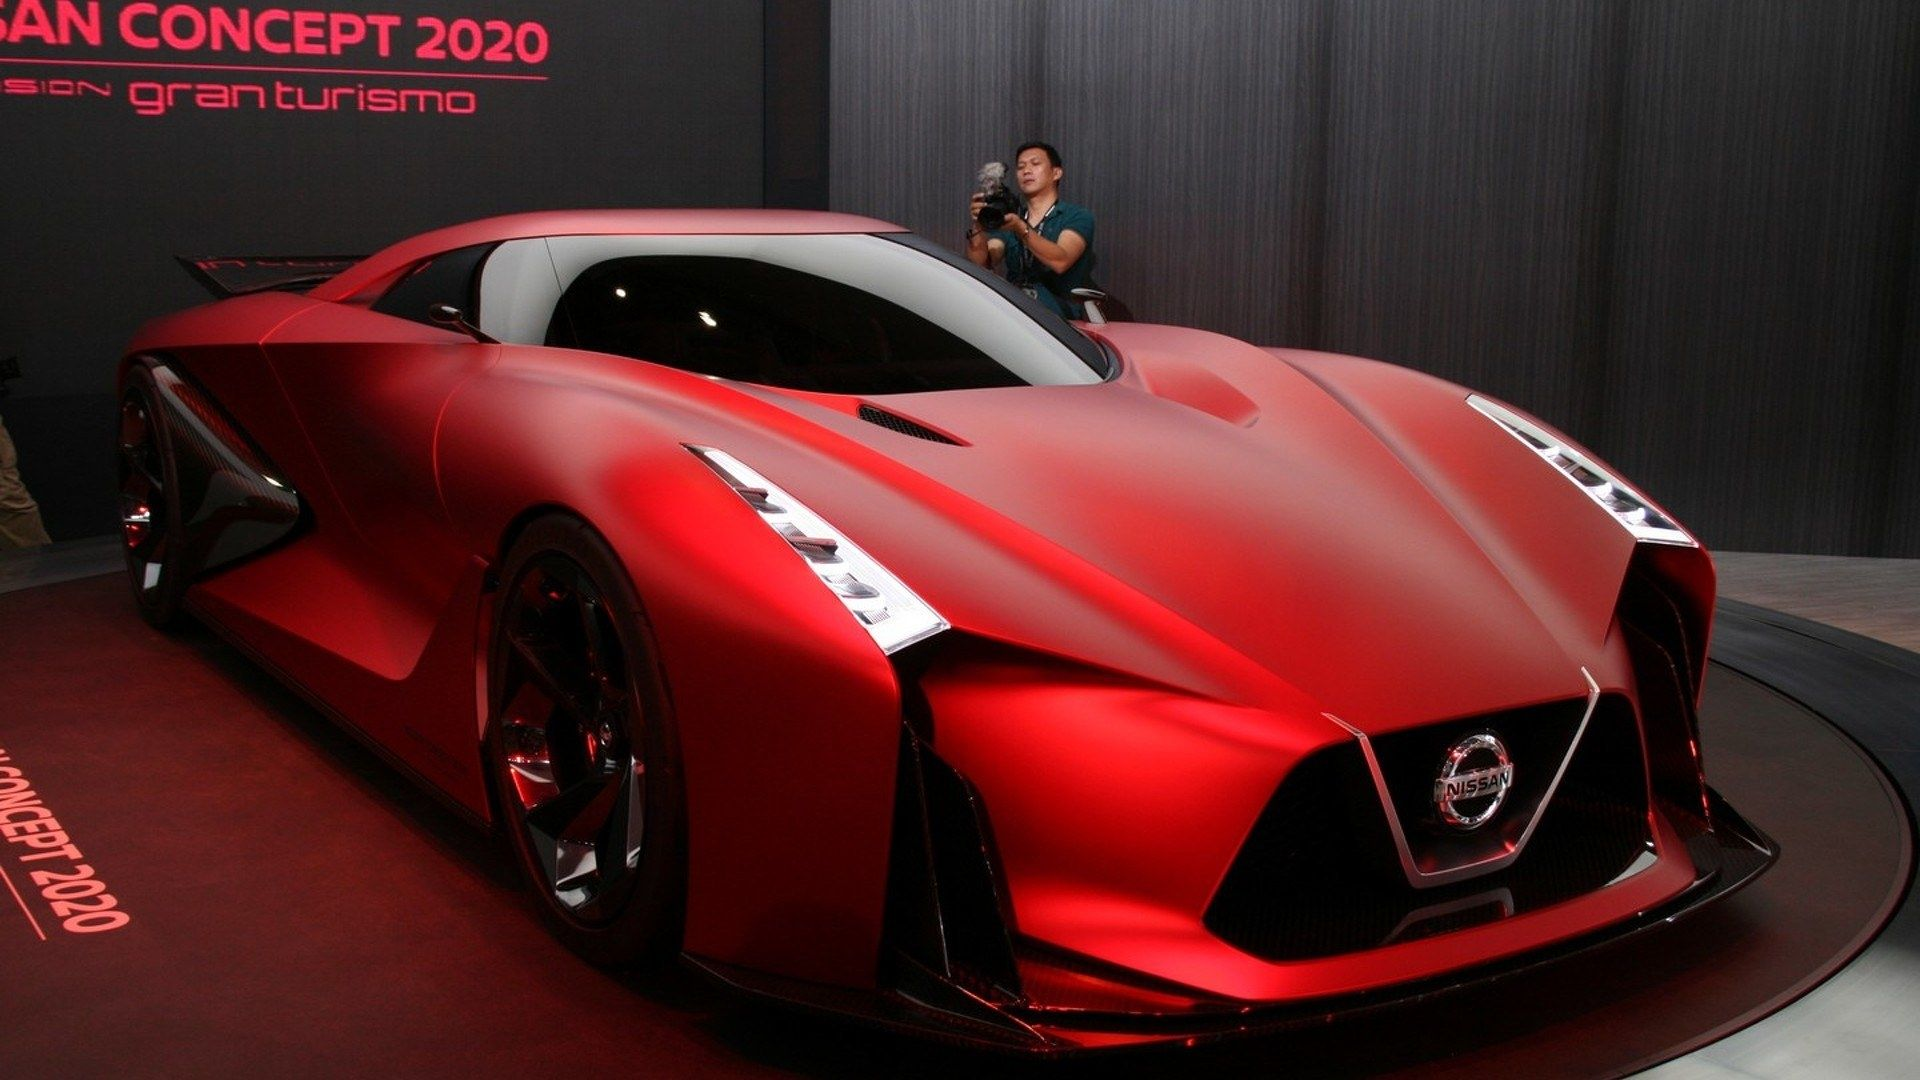 The Is This Next Gen Nissan Gt R R36 Render Plausible Picture Nissan Gtr Nissan Gt Nissan Gt R